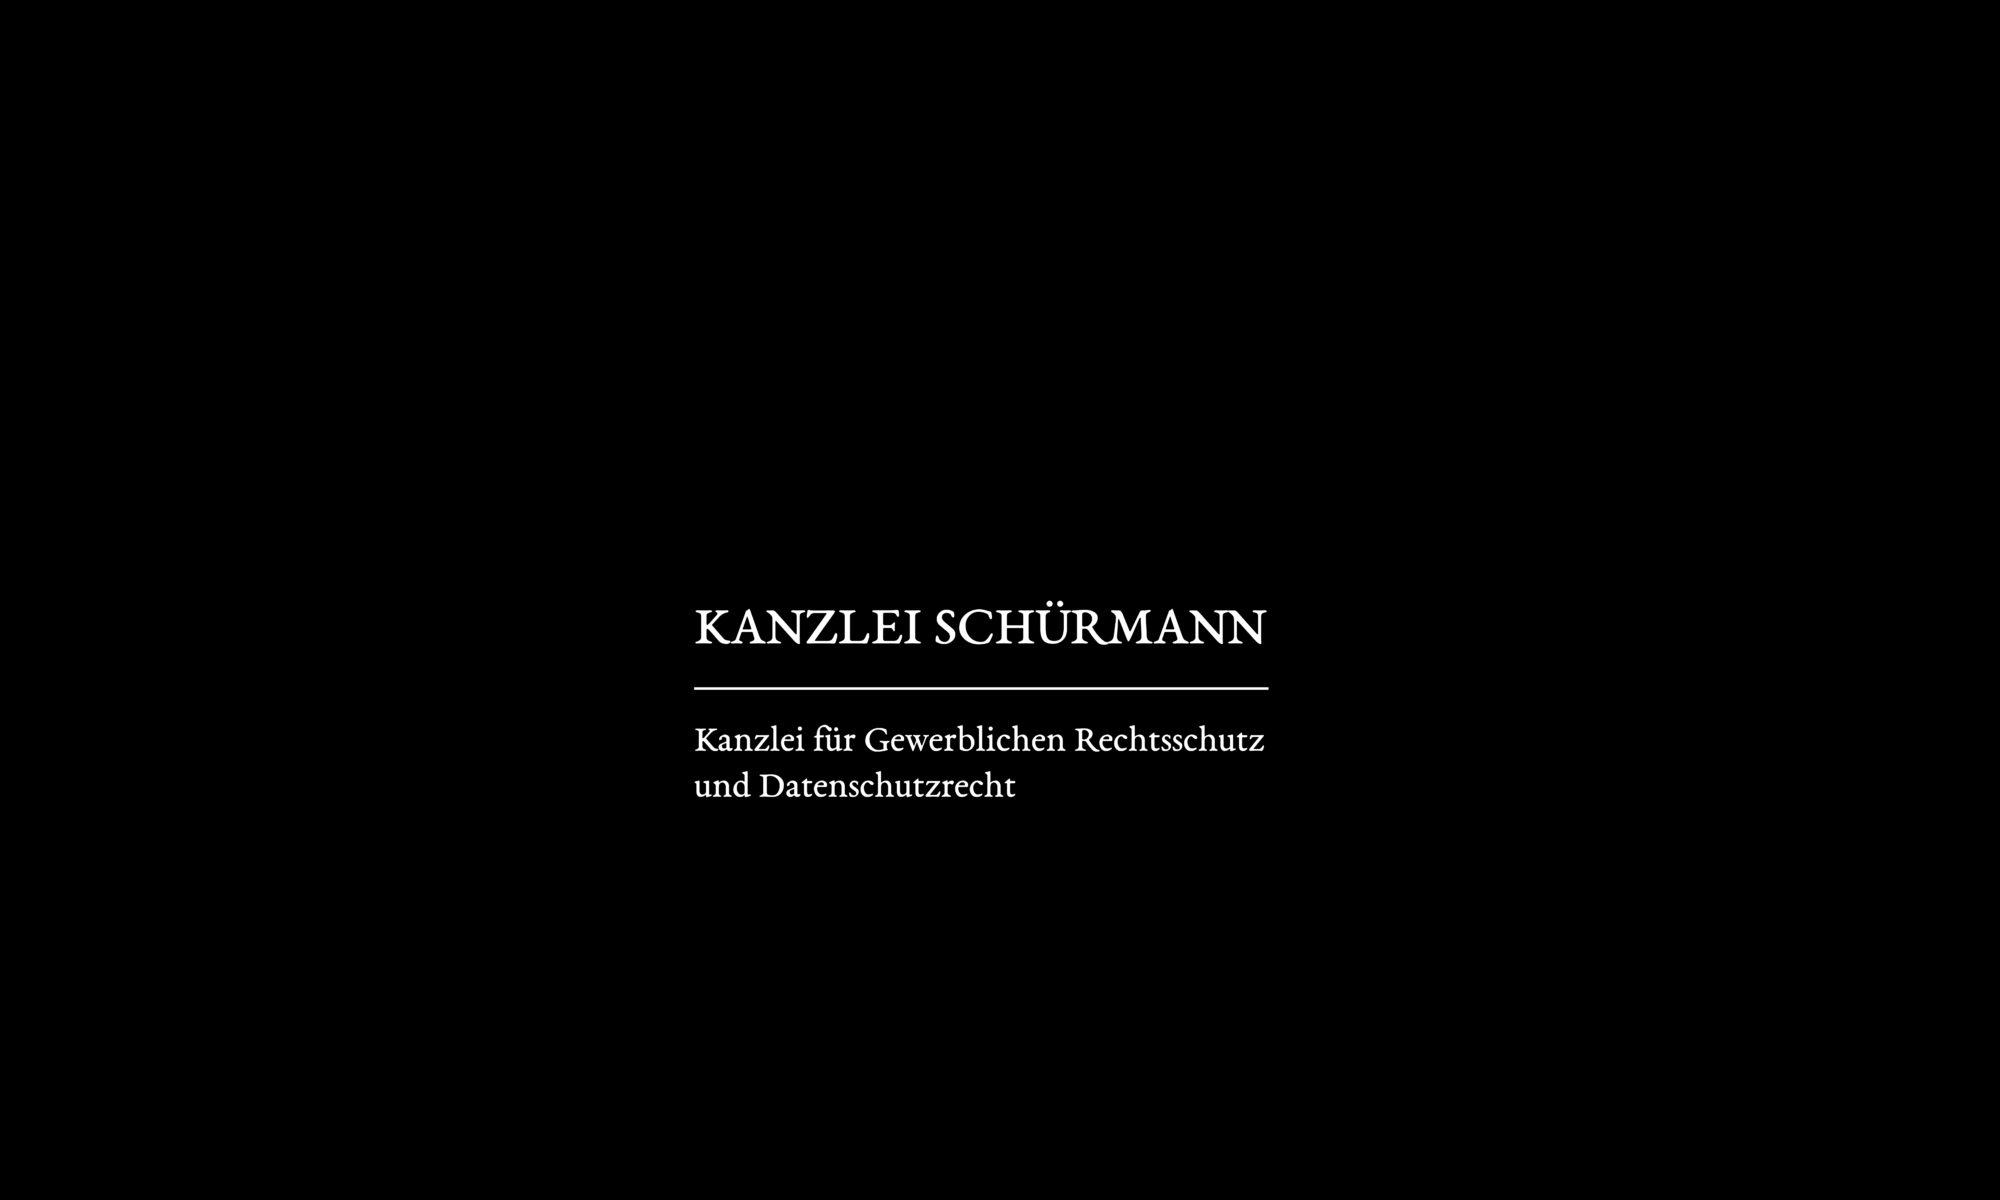 Kanzlei Schürmann